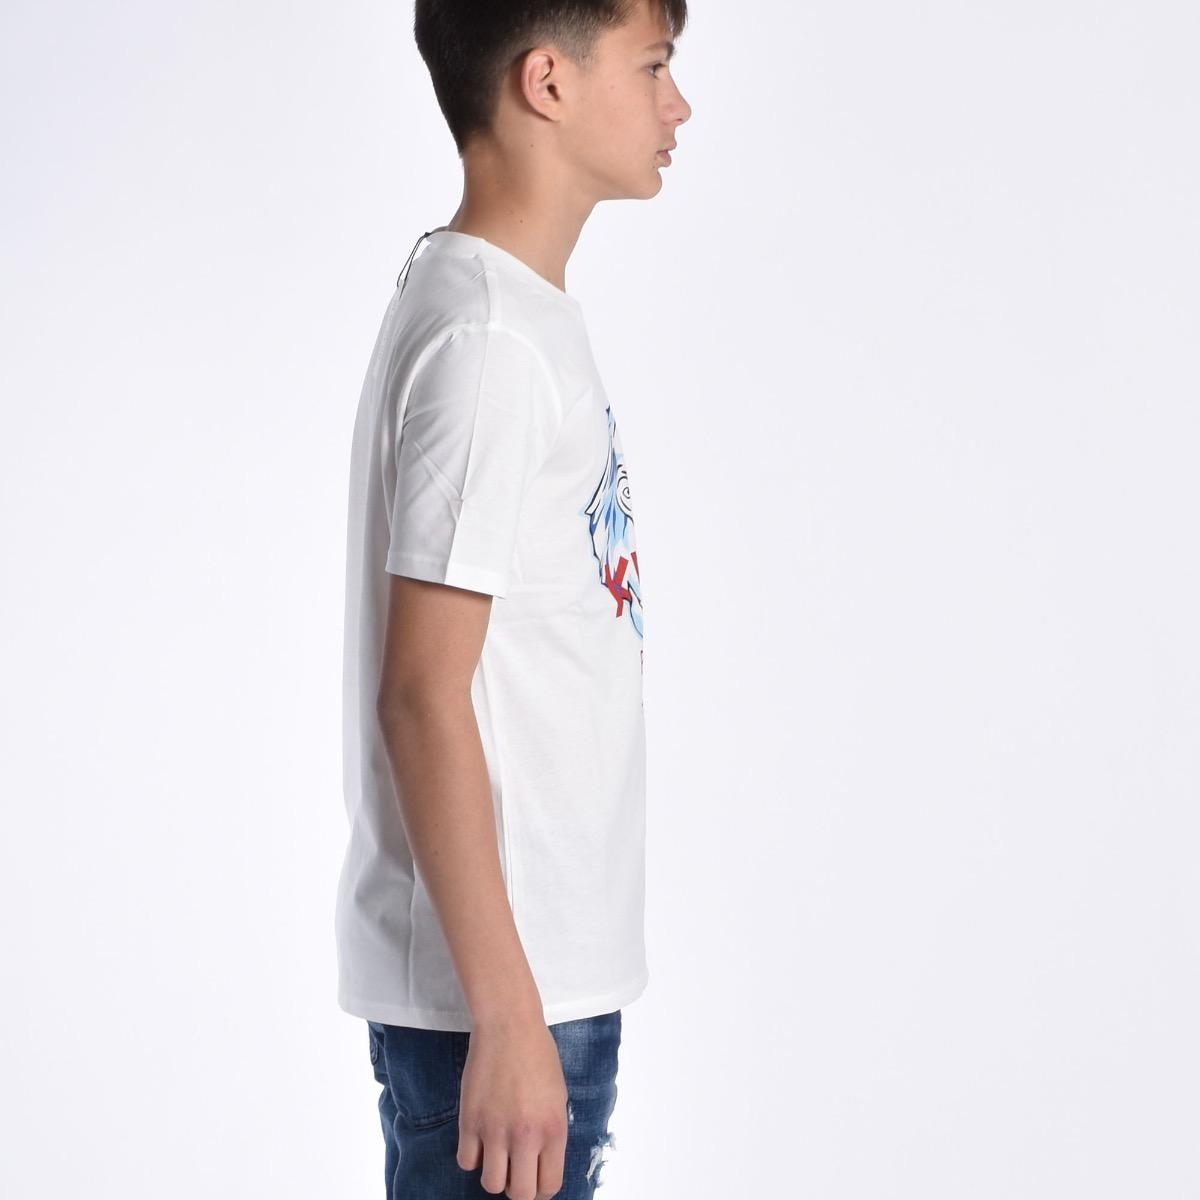 T-shirt con elefante - Bianca